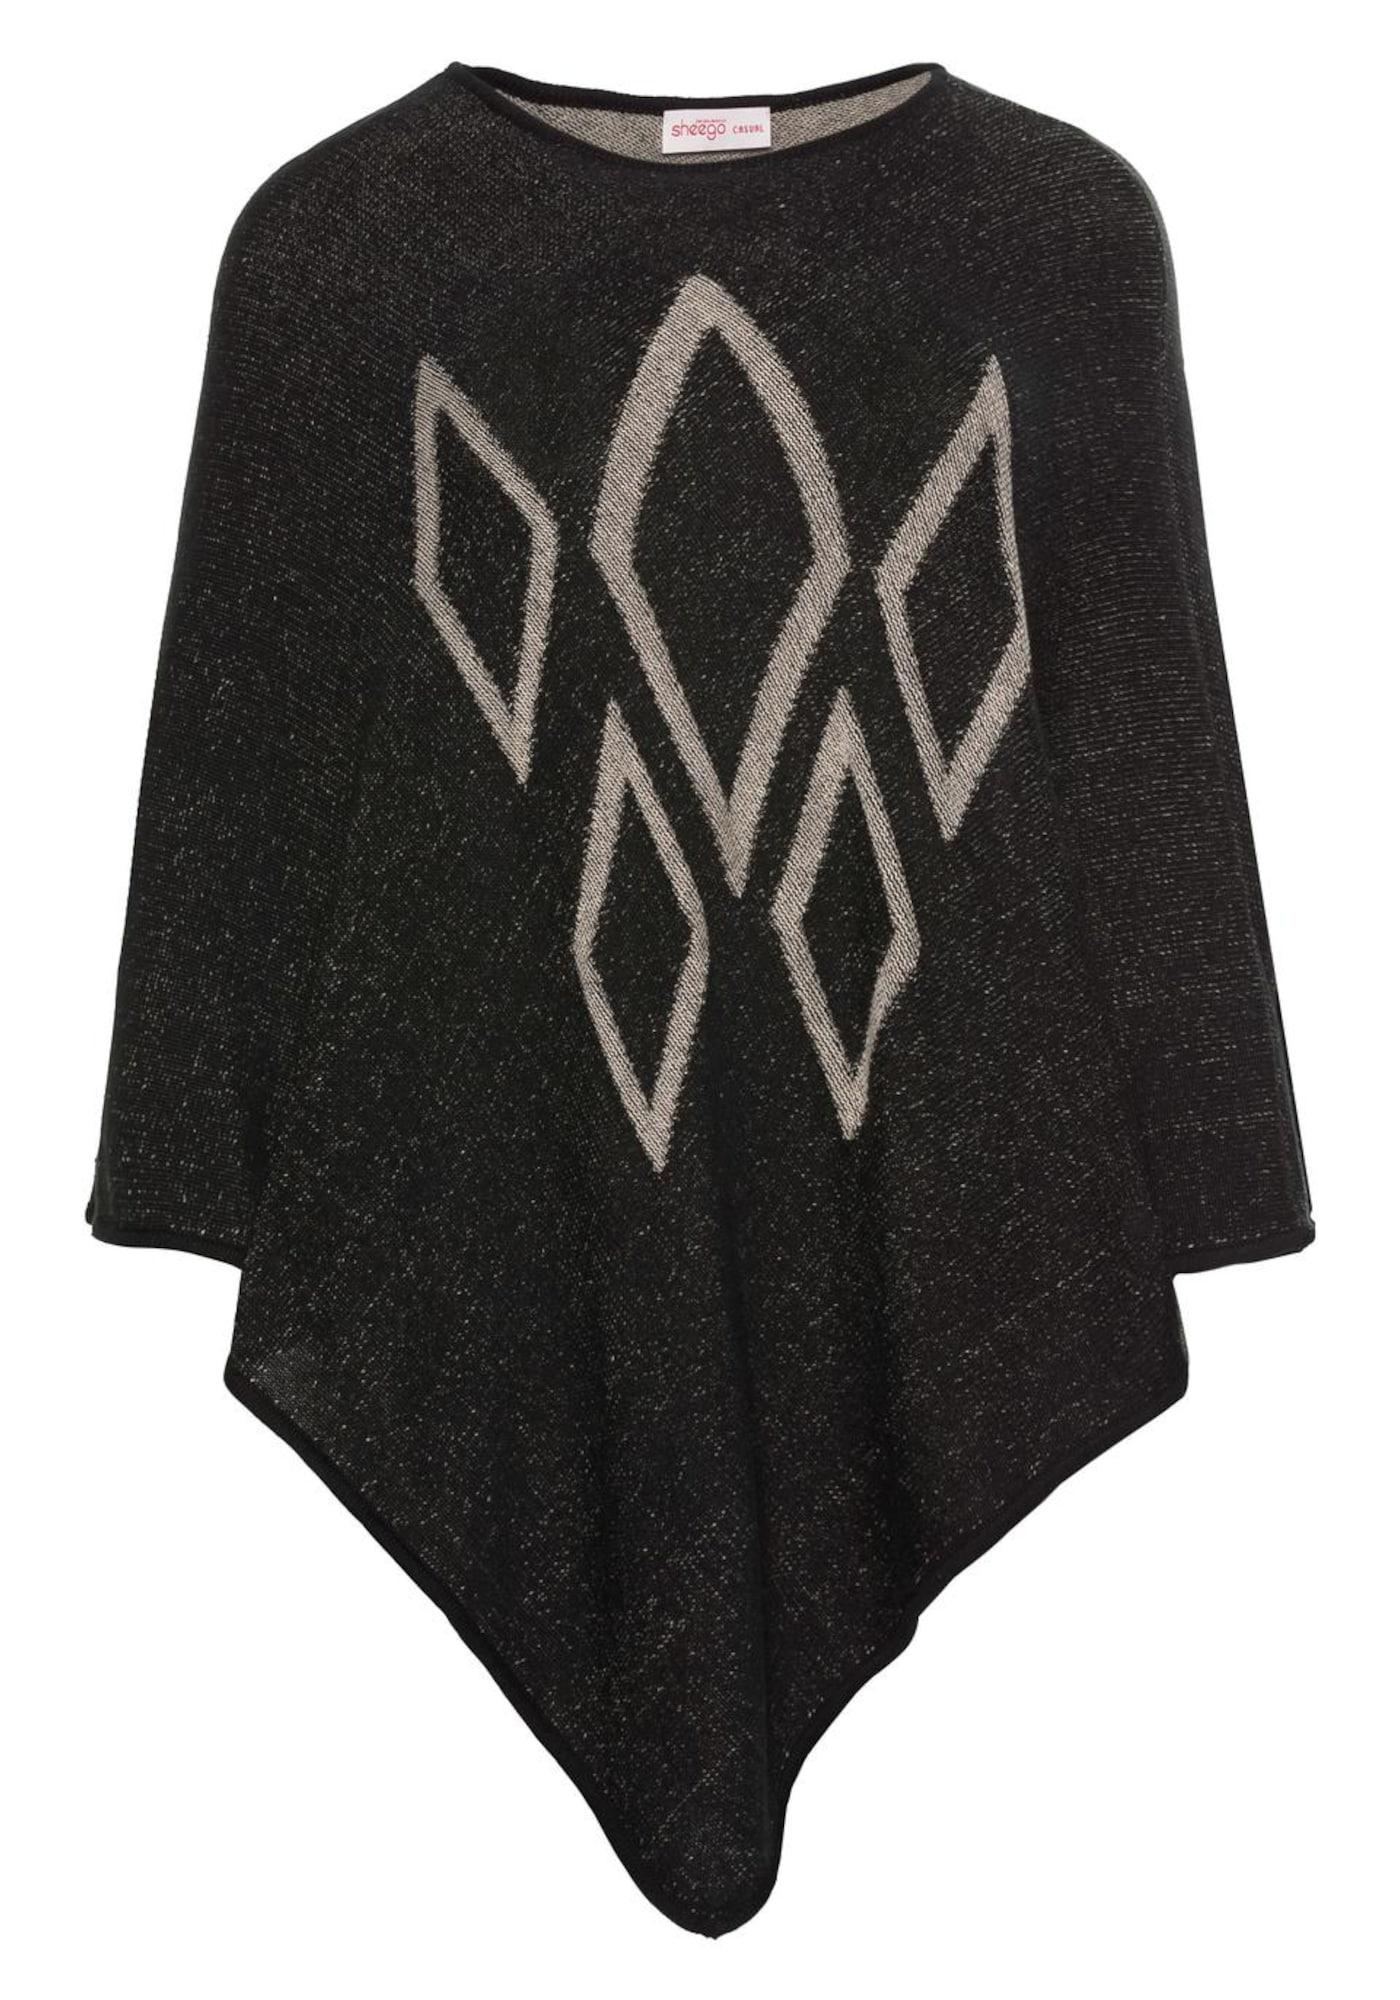 Poncho | Bekleidung > Pullover > Ponchos & Capes | Schwarz | SHEEGO